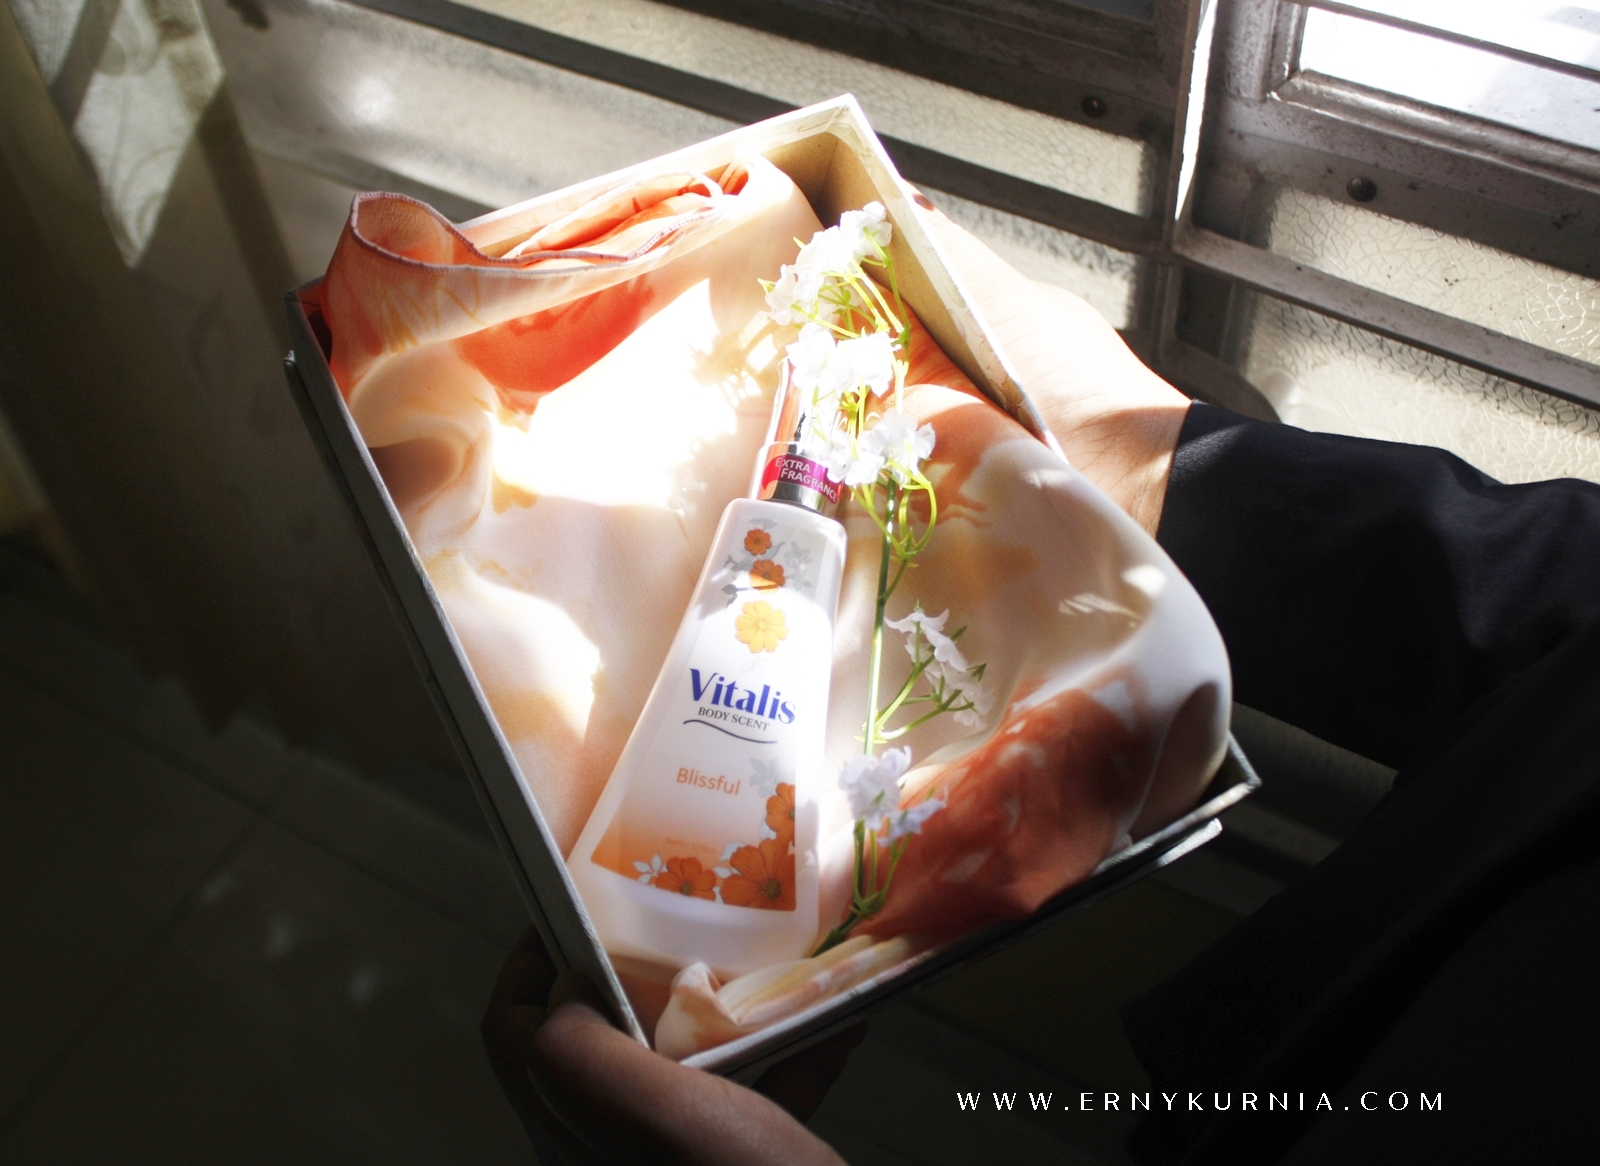 Vitalis Body Scent Blissful, Vitalis Parfume, Review Parfum Vitalis